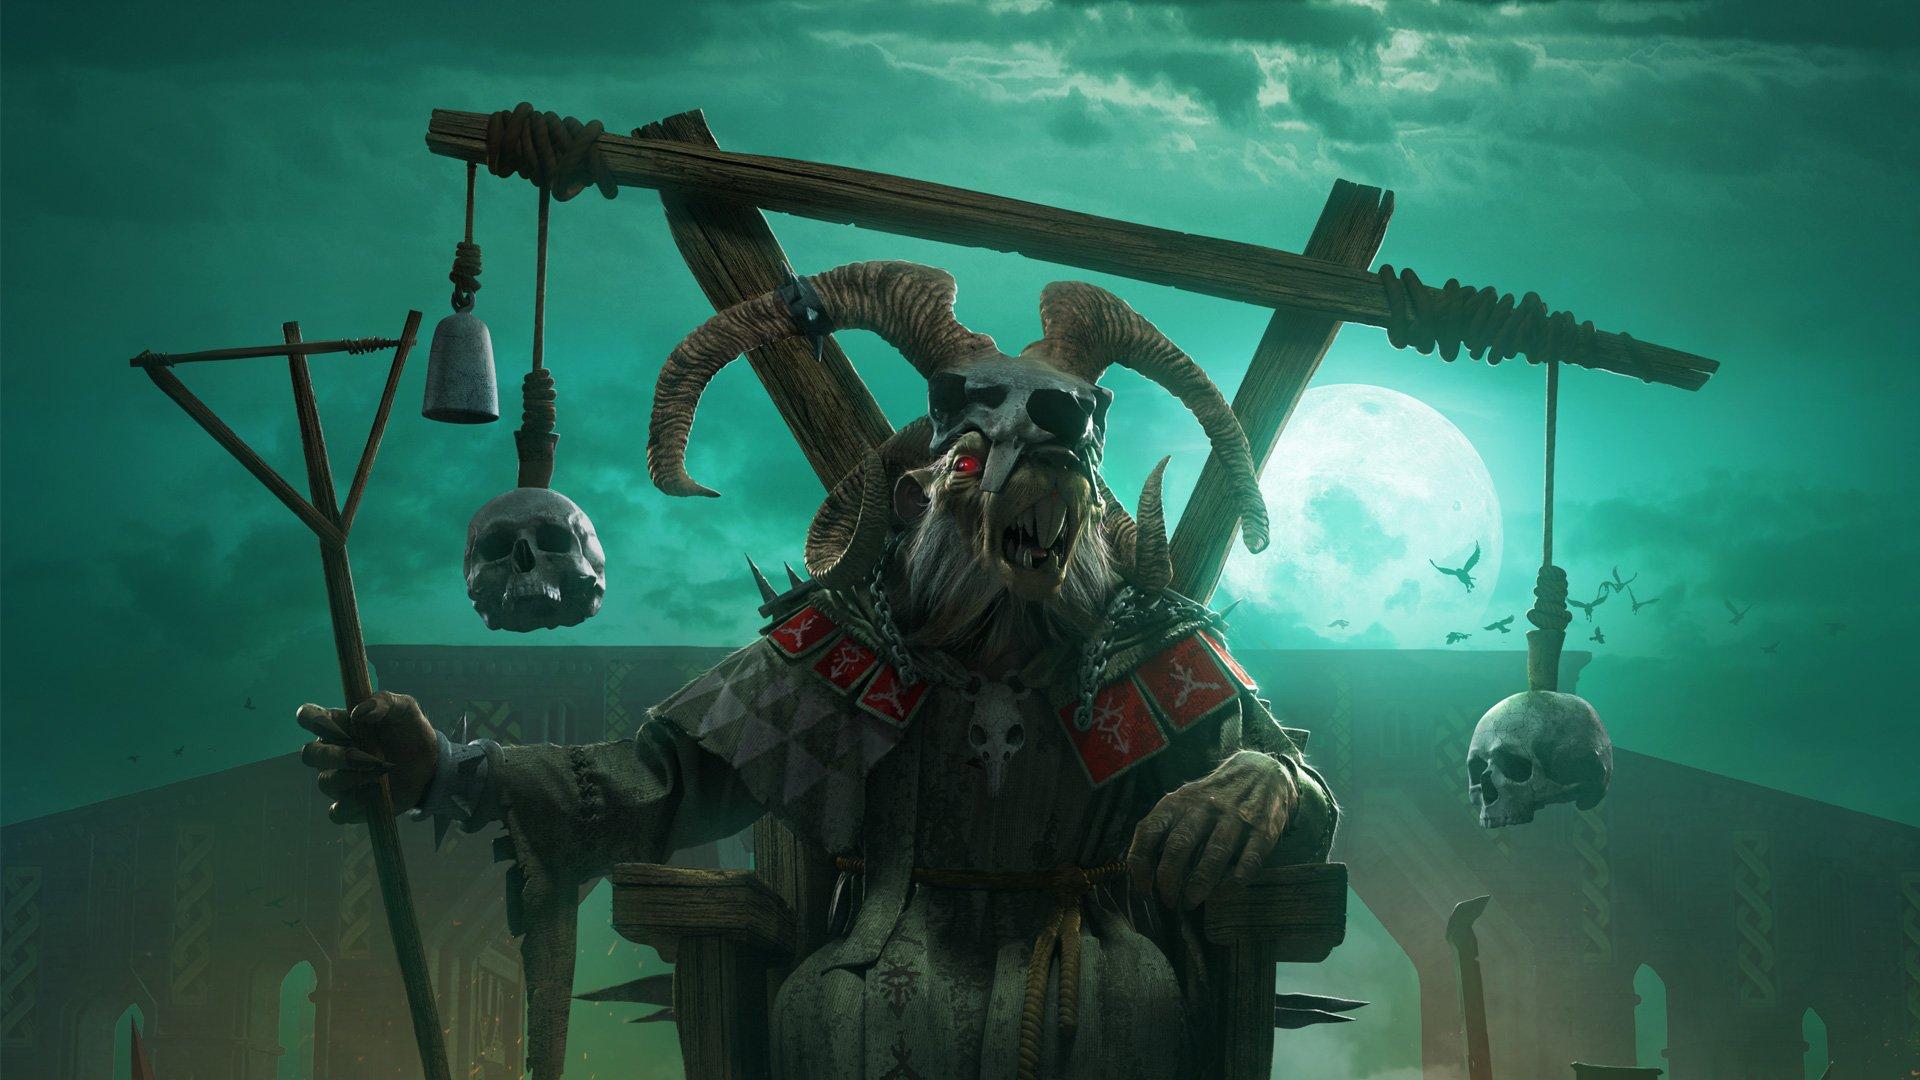 [PC] Немного о Warhammer: End Times - Vermintide. - Изображение 1